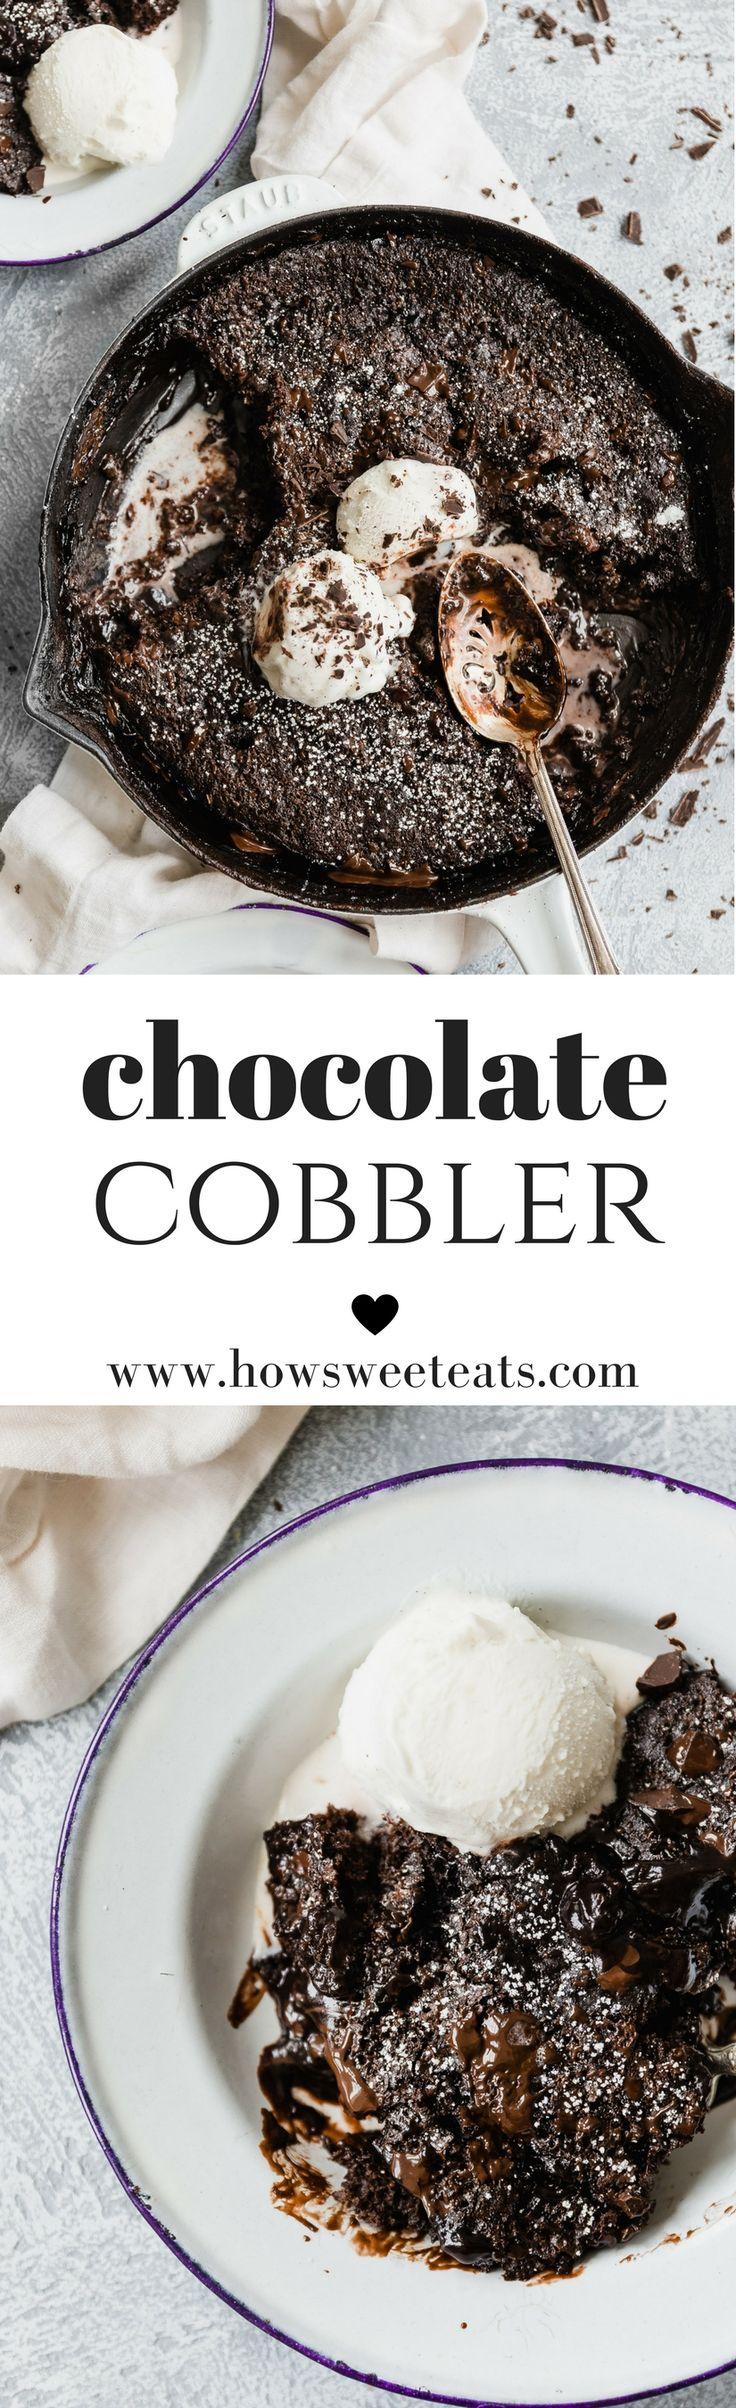 Chocolate Cobbler! The most indulgent, perfect dessert. I howsweeteats.com @howsweeteats